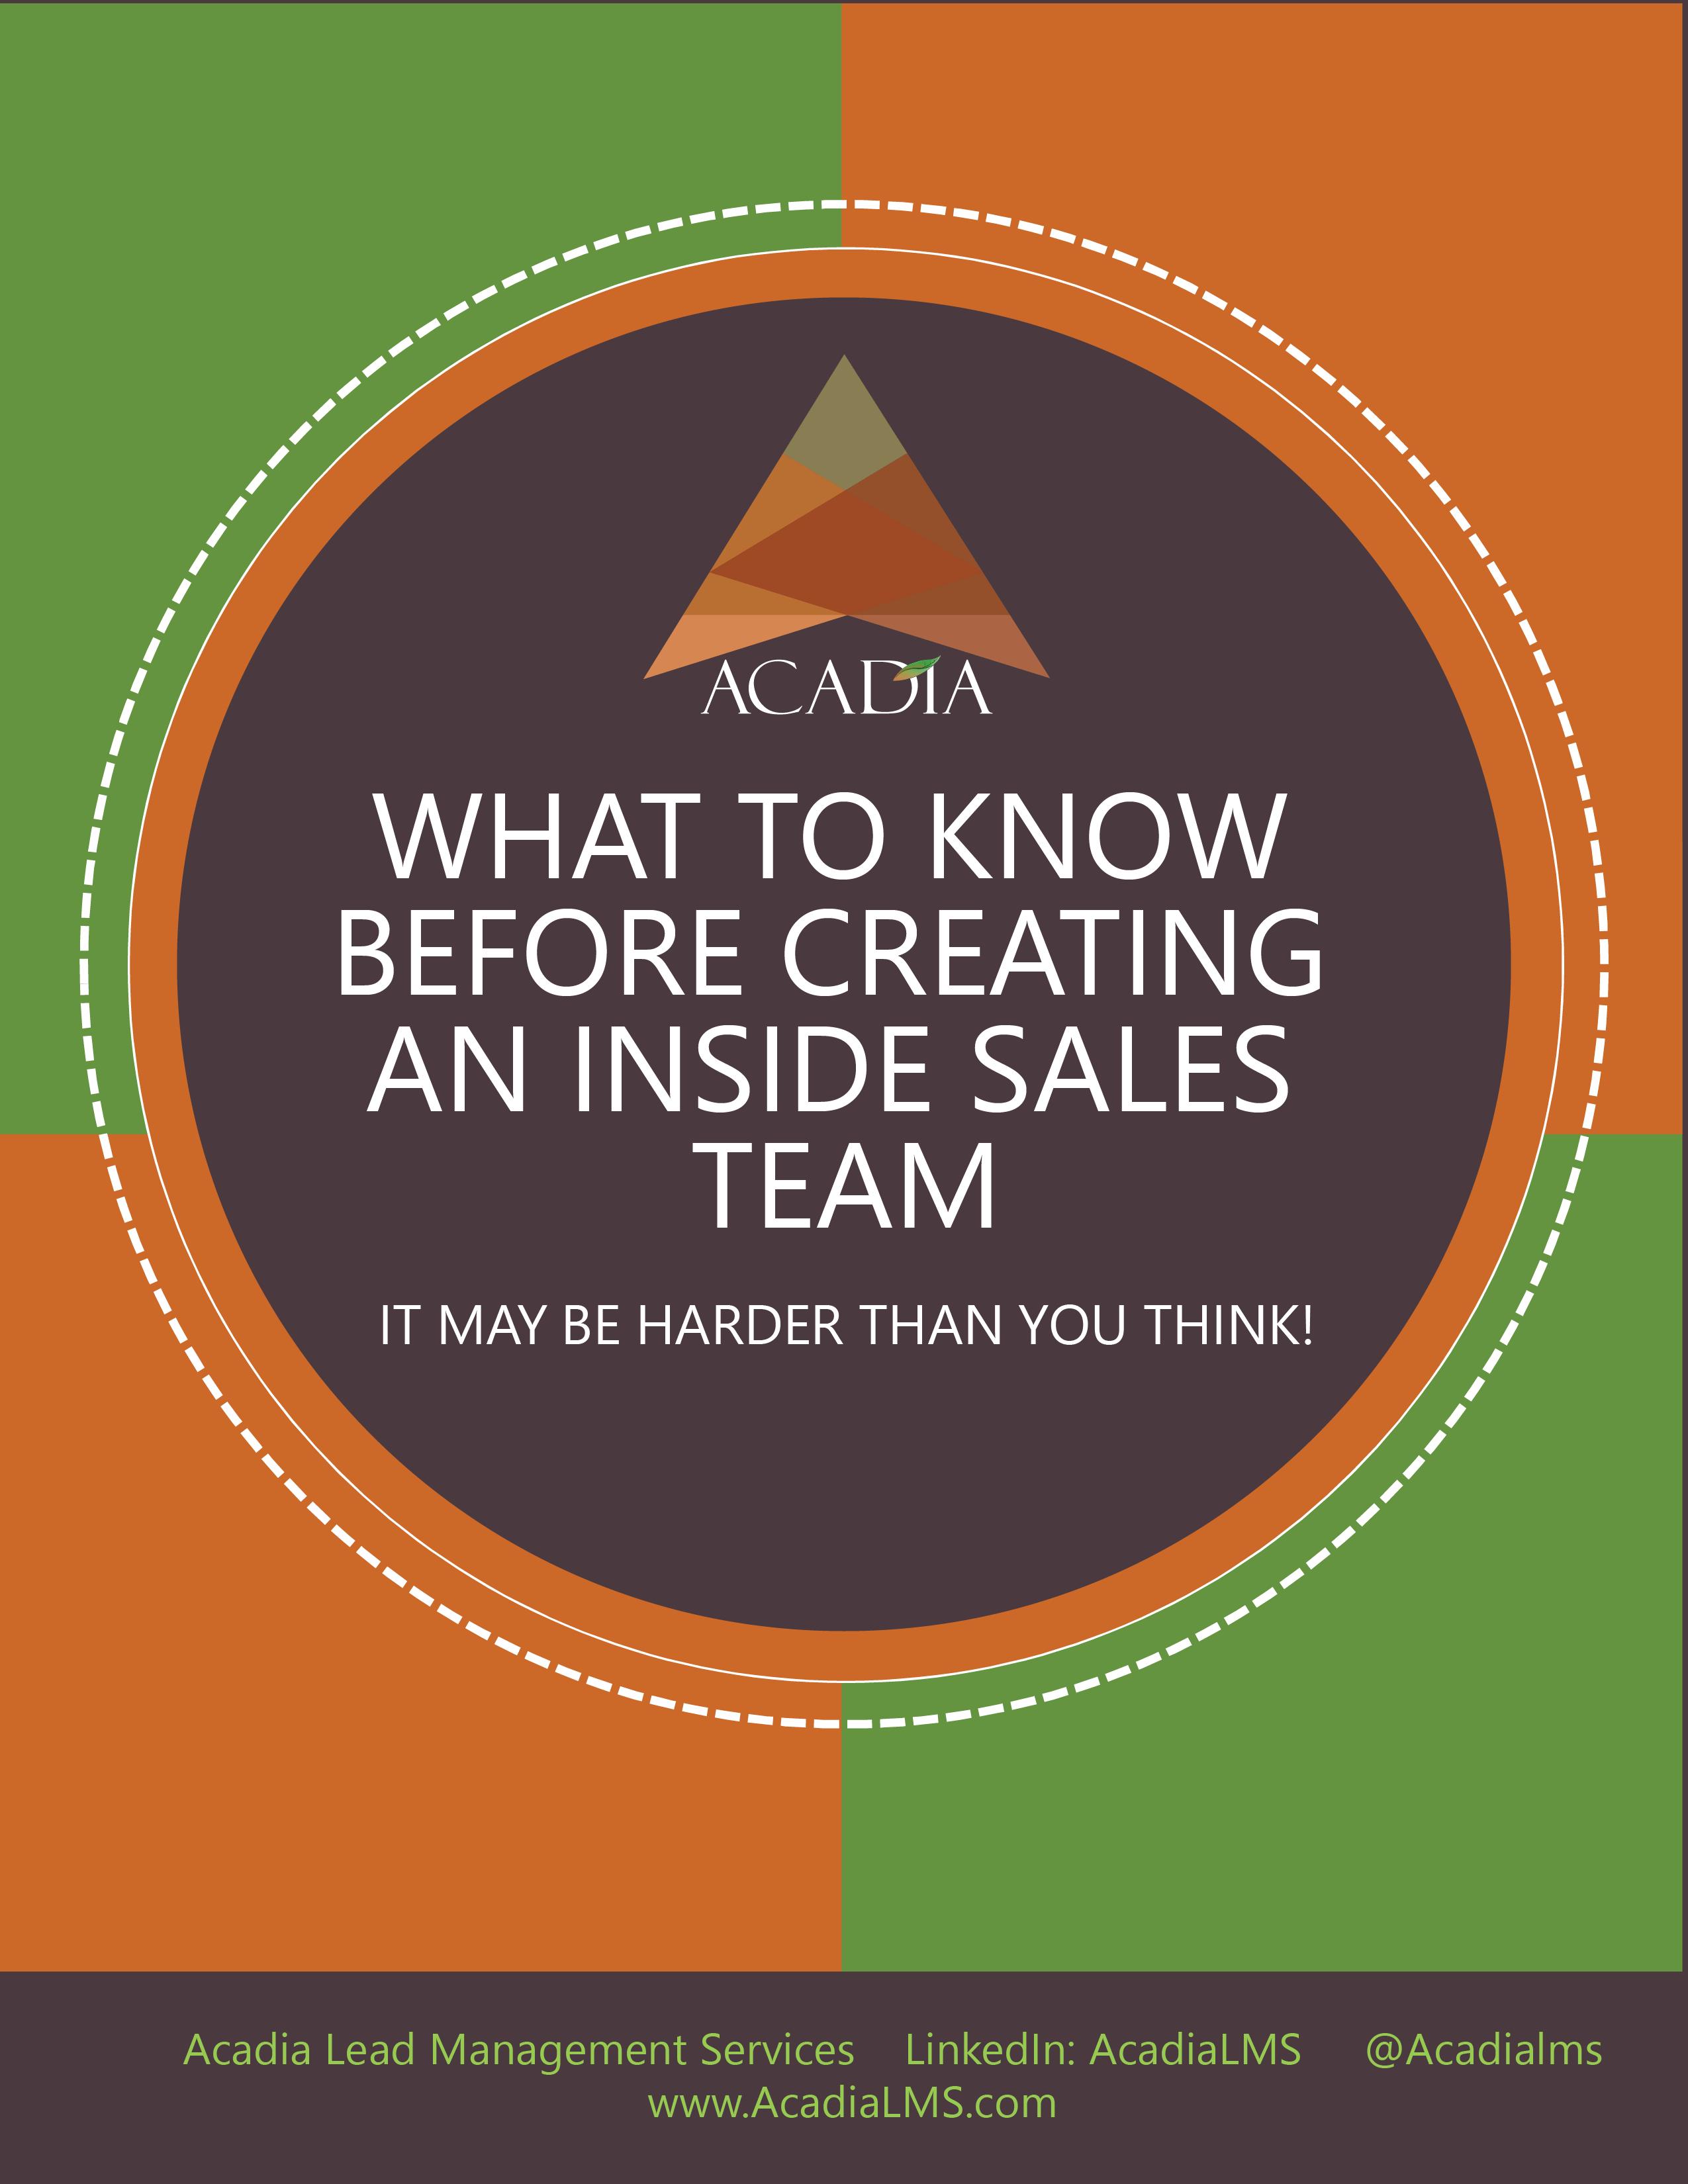 creating-an-inside-sales-team-2